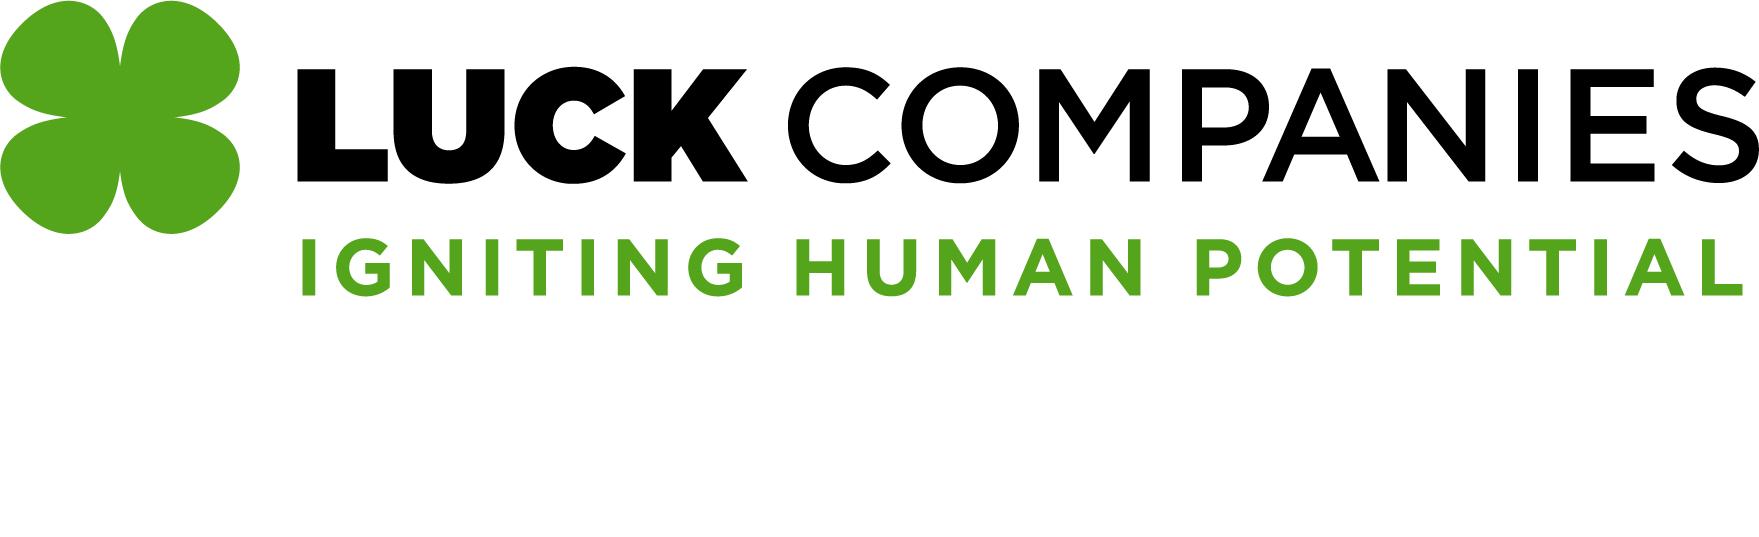 Luck Companies logo